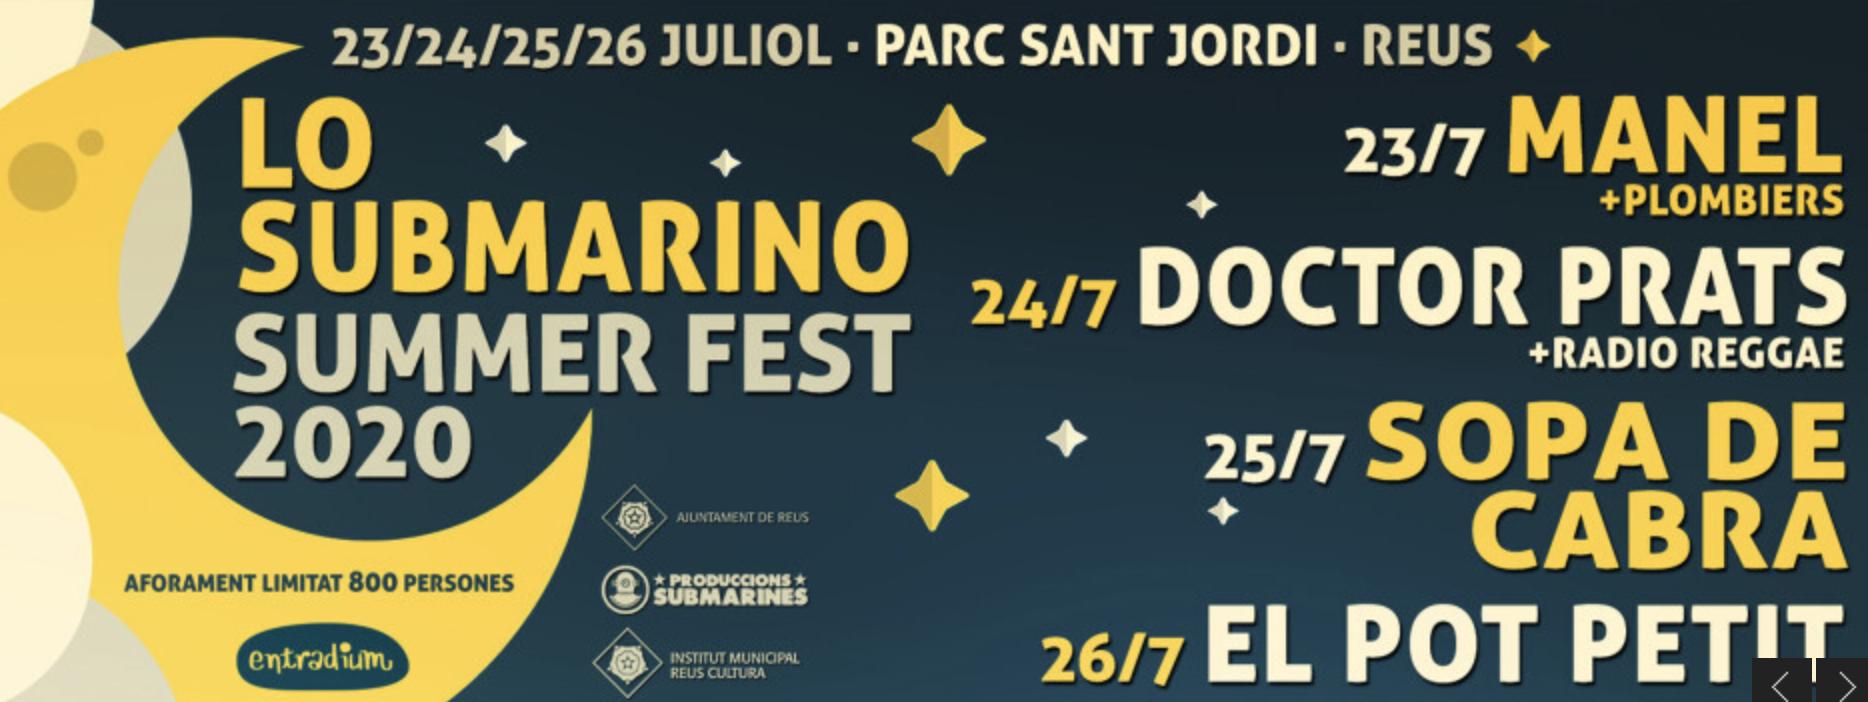 Submarino Festival- Manel, Doctor Prats, Sopa de Cabra i El Pot PetitE